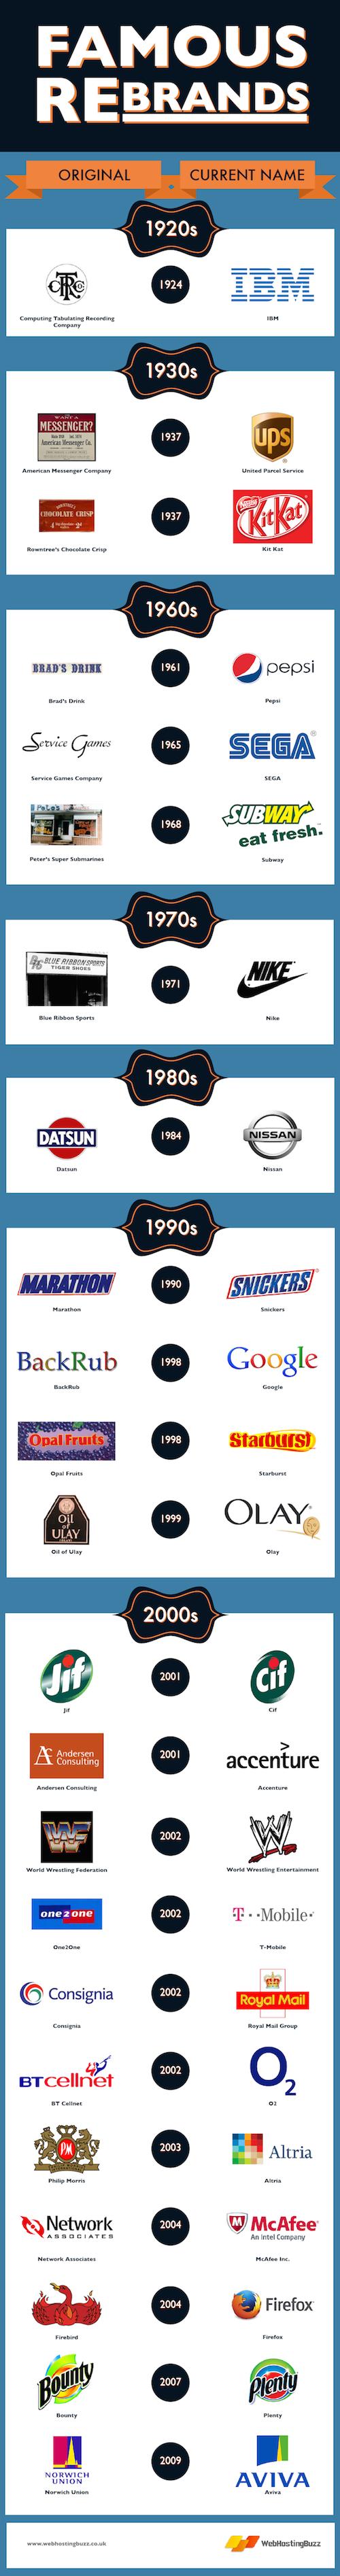 famous-rebrands